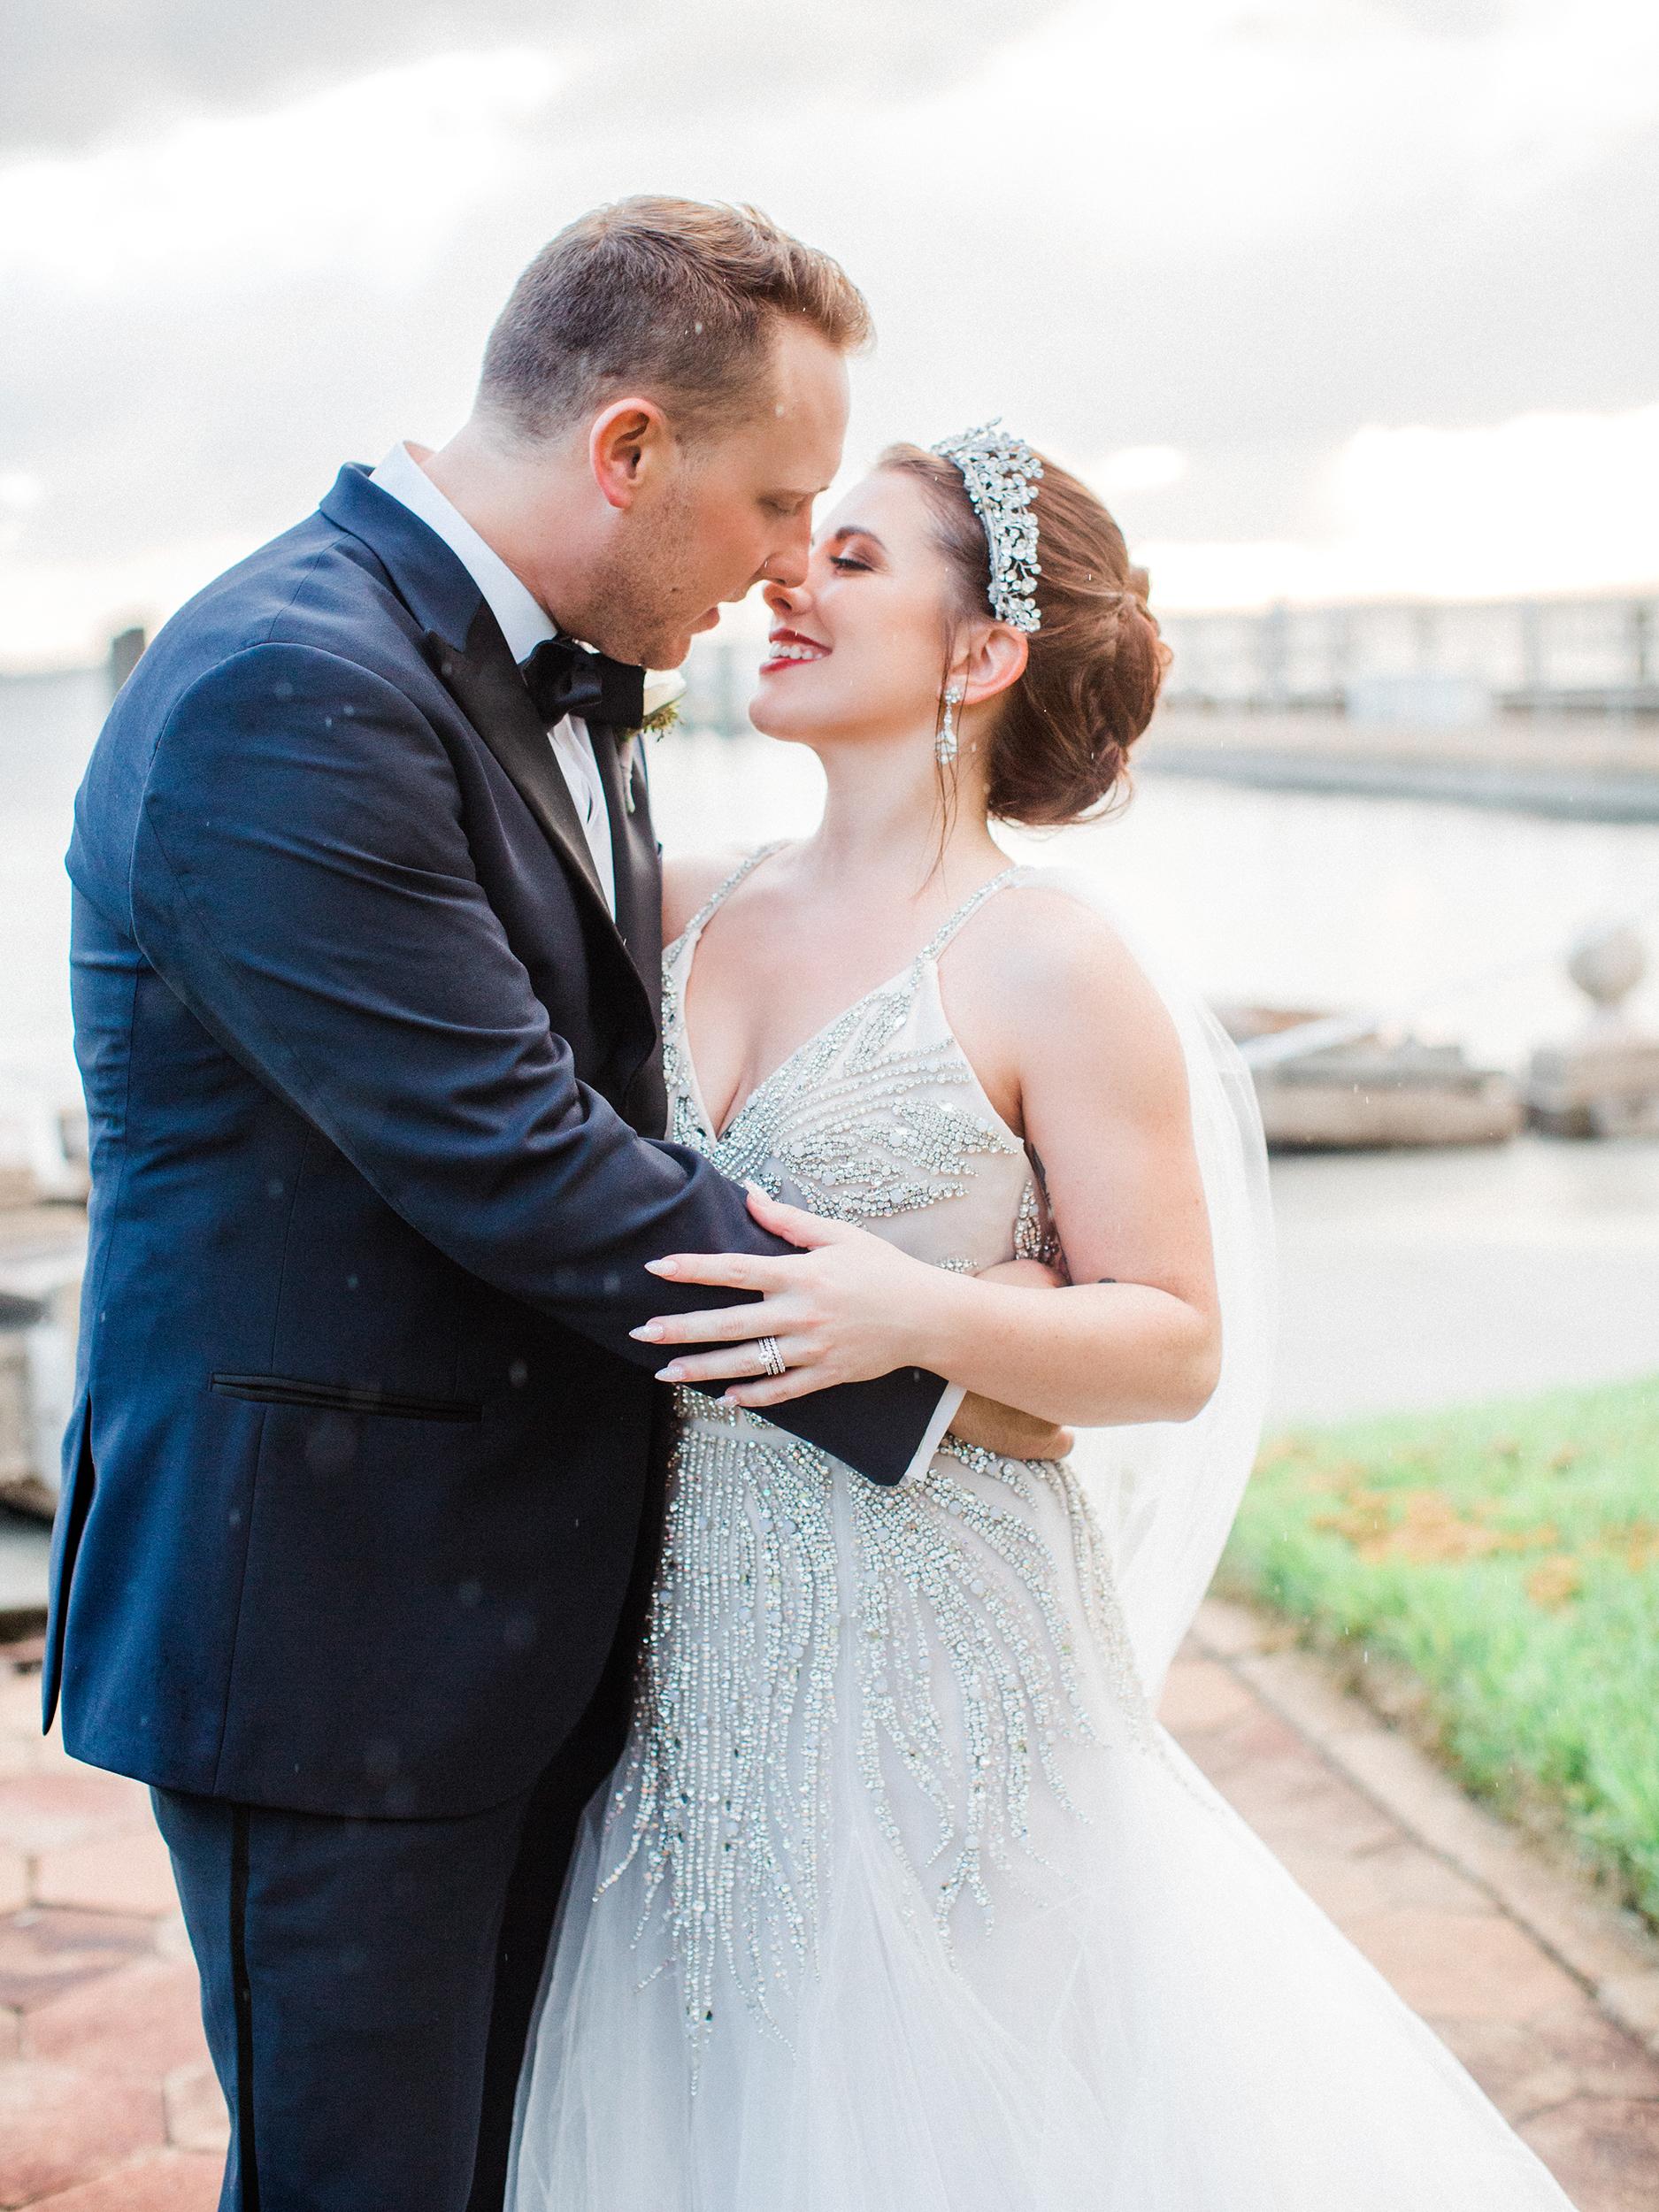 Lisa Silva Photography- Jacksonville, Florida Fine Art Film Wedding Photography Epping Forrest Yacht Club 48.jpg